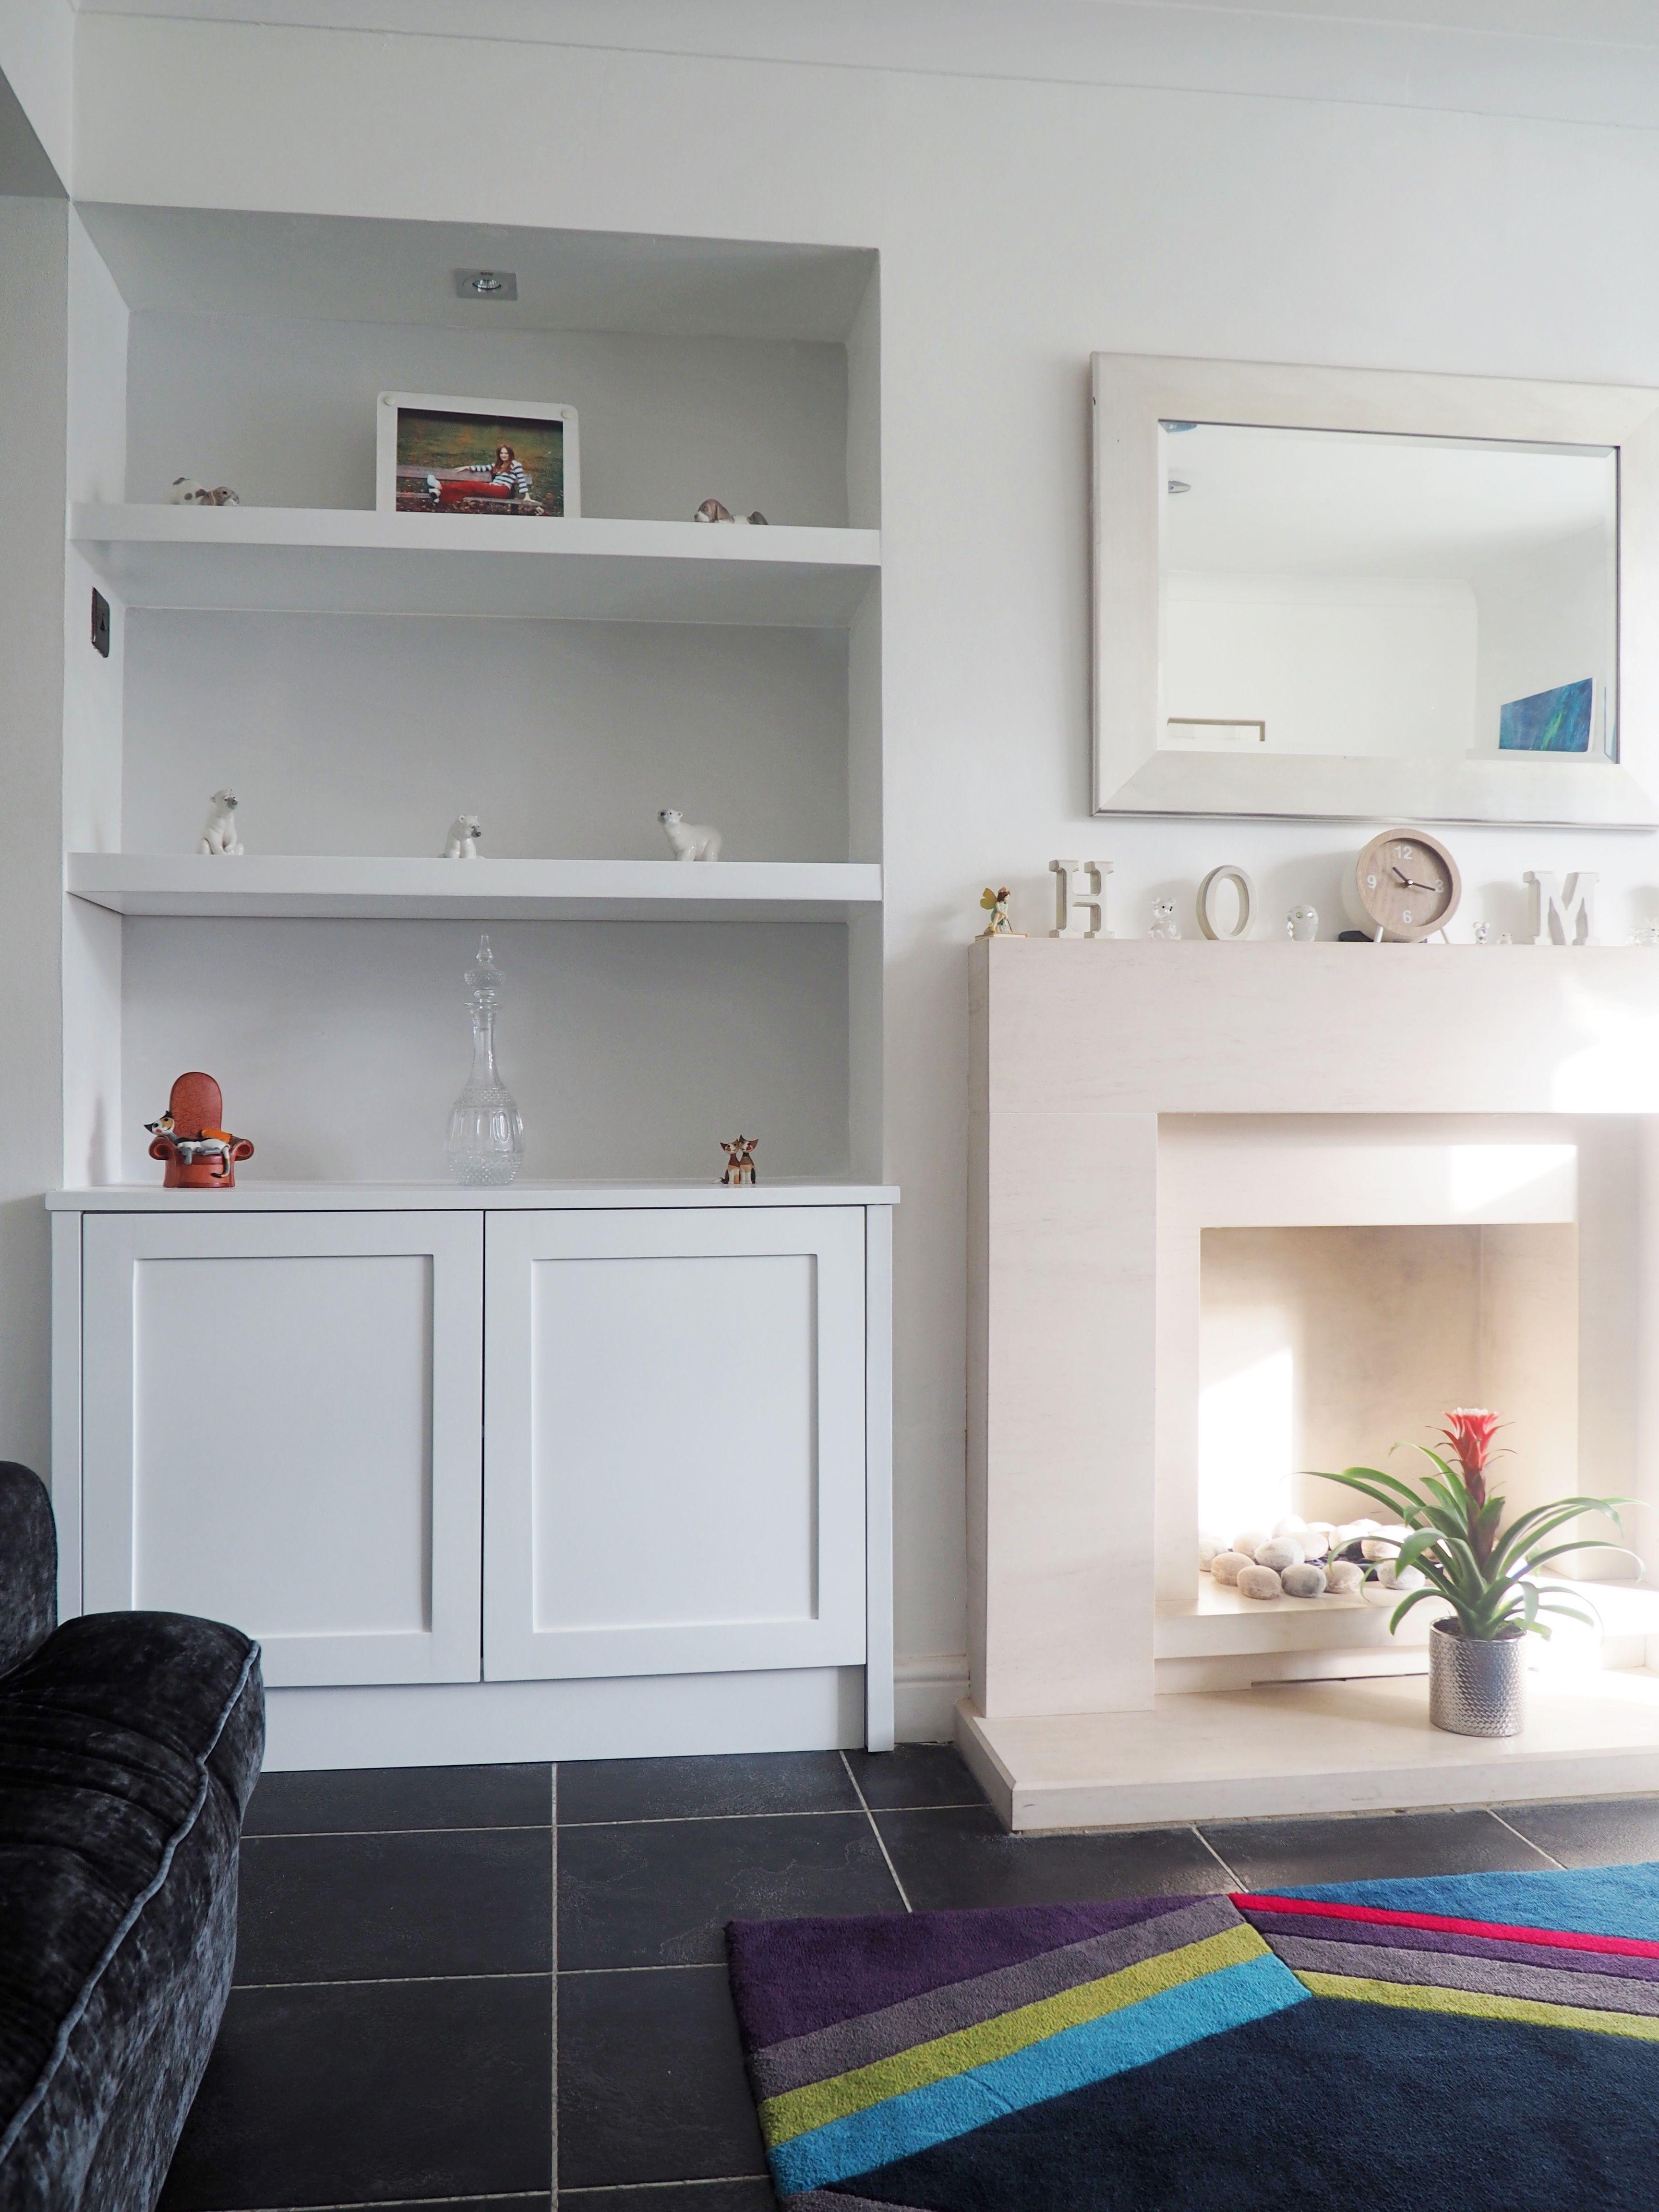 Shaker Alcove Cabinets With Floating Shelves - U Furniture Ltd ...